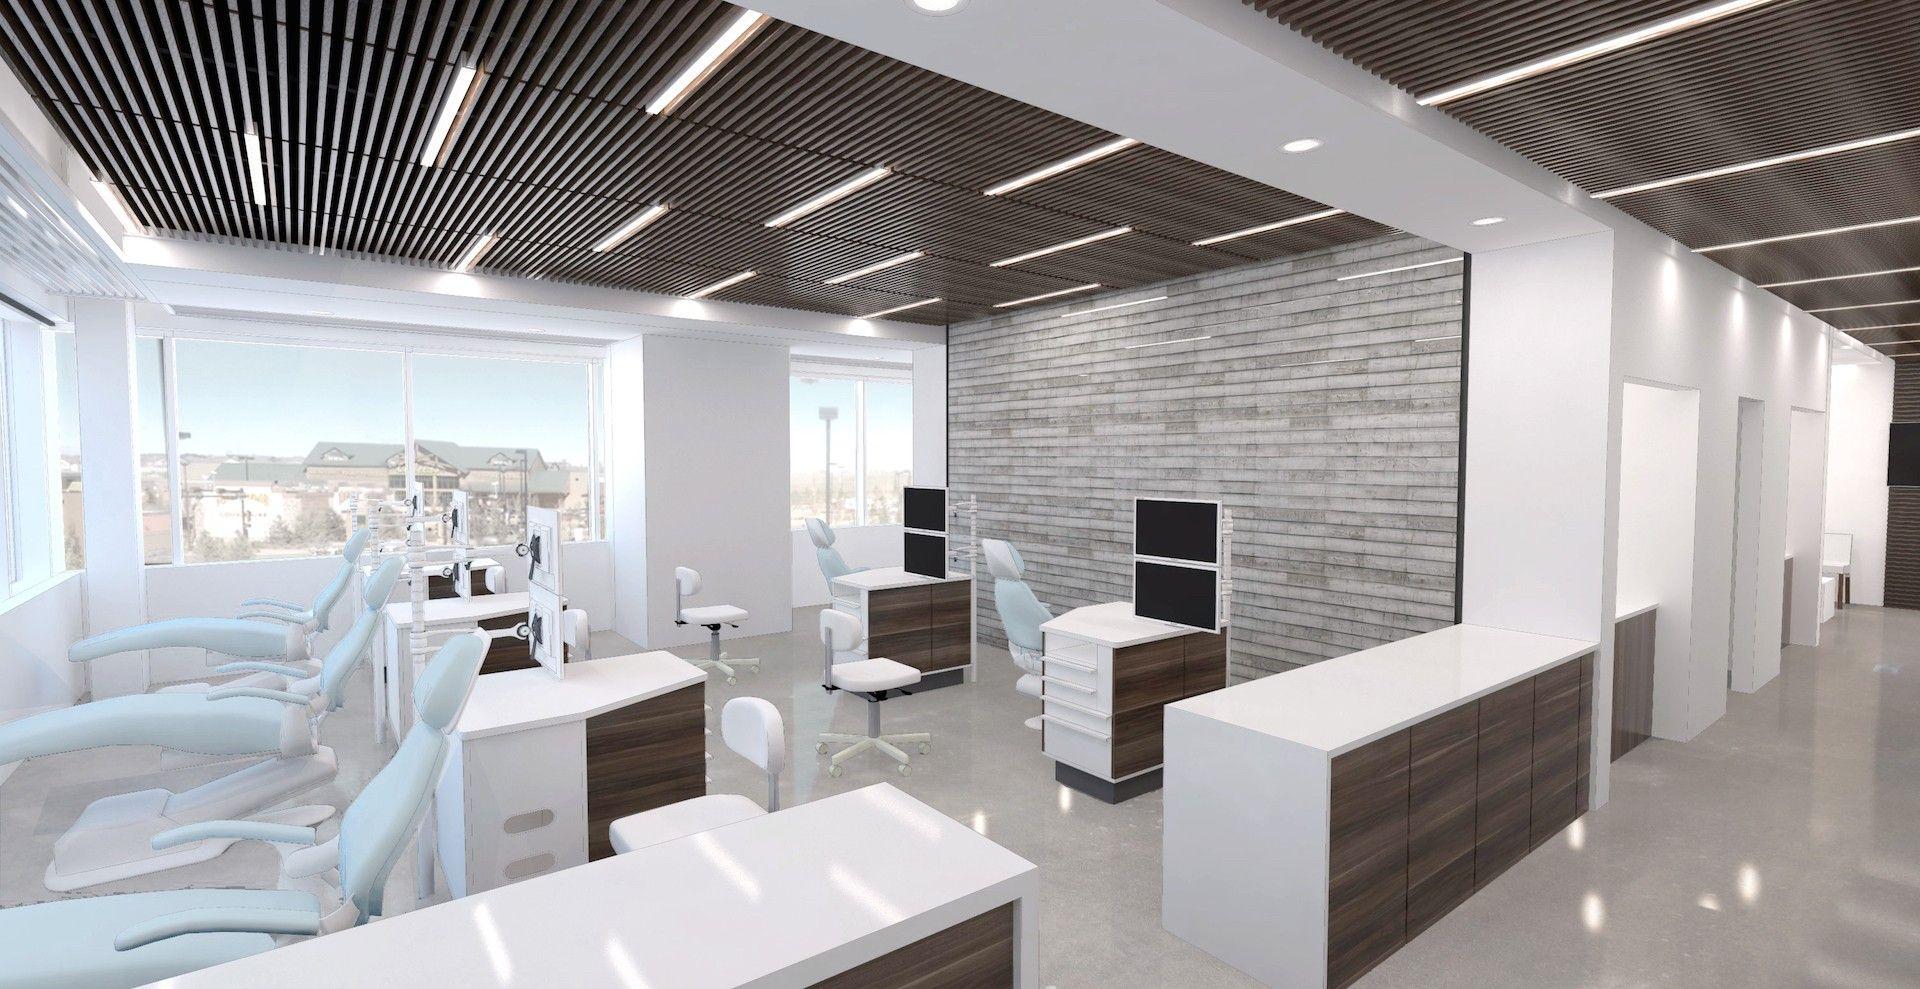 orthodontic office design - Buscar con Google | Clínicas ...